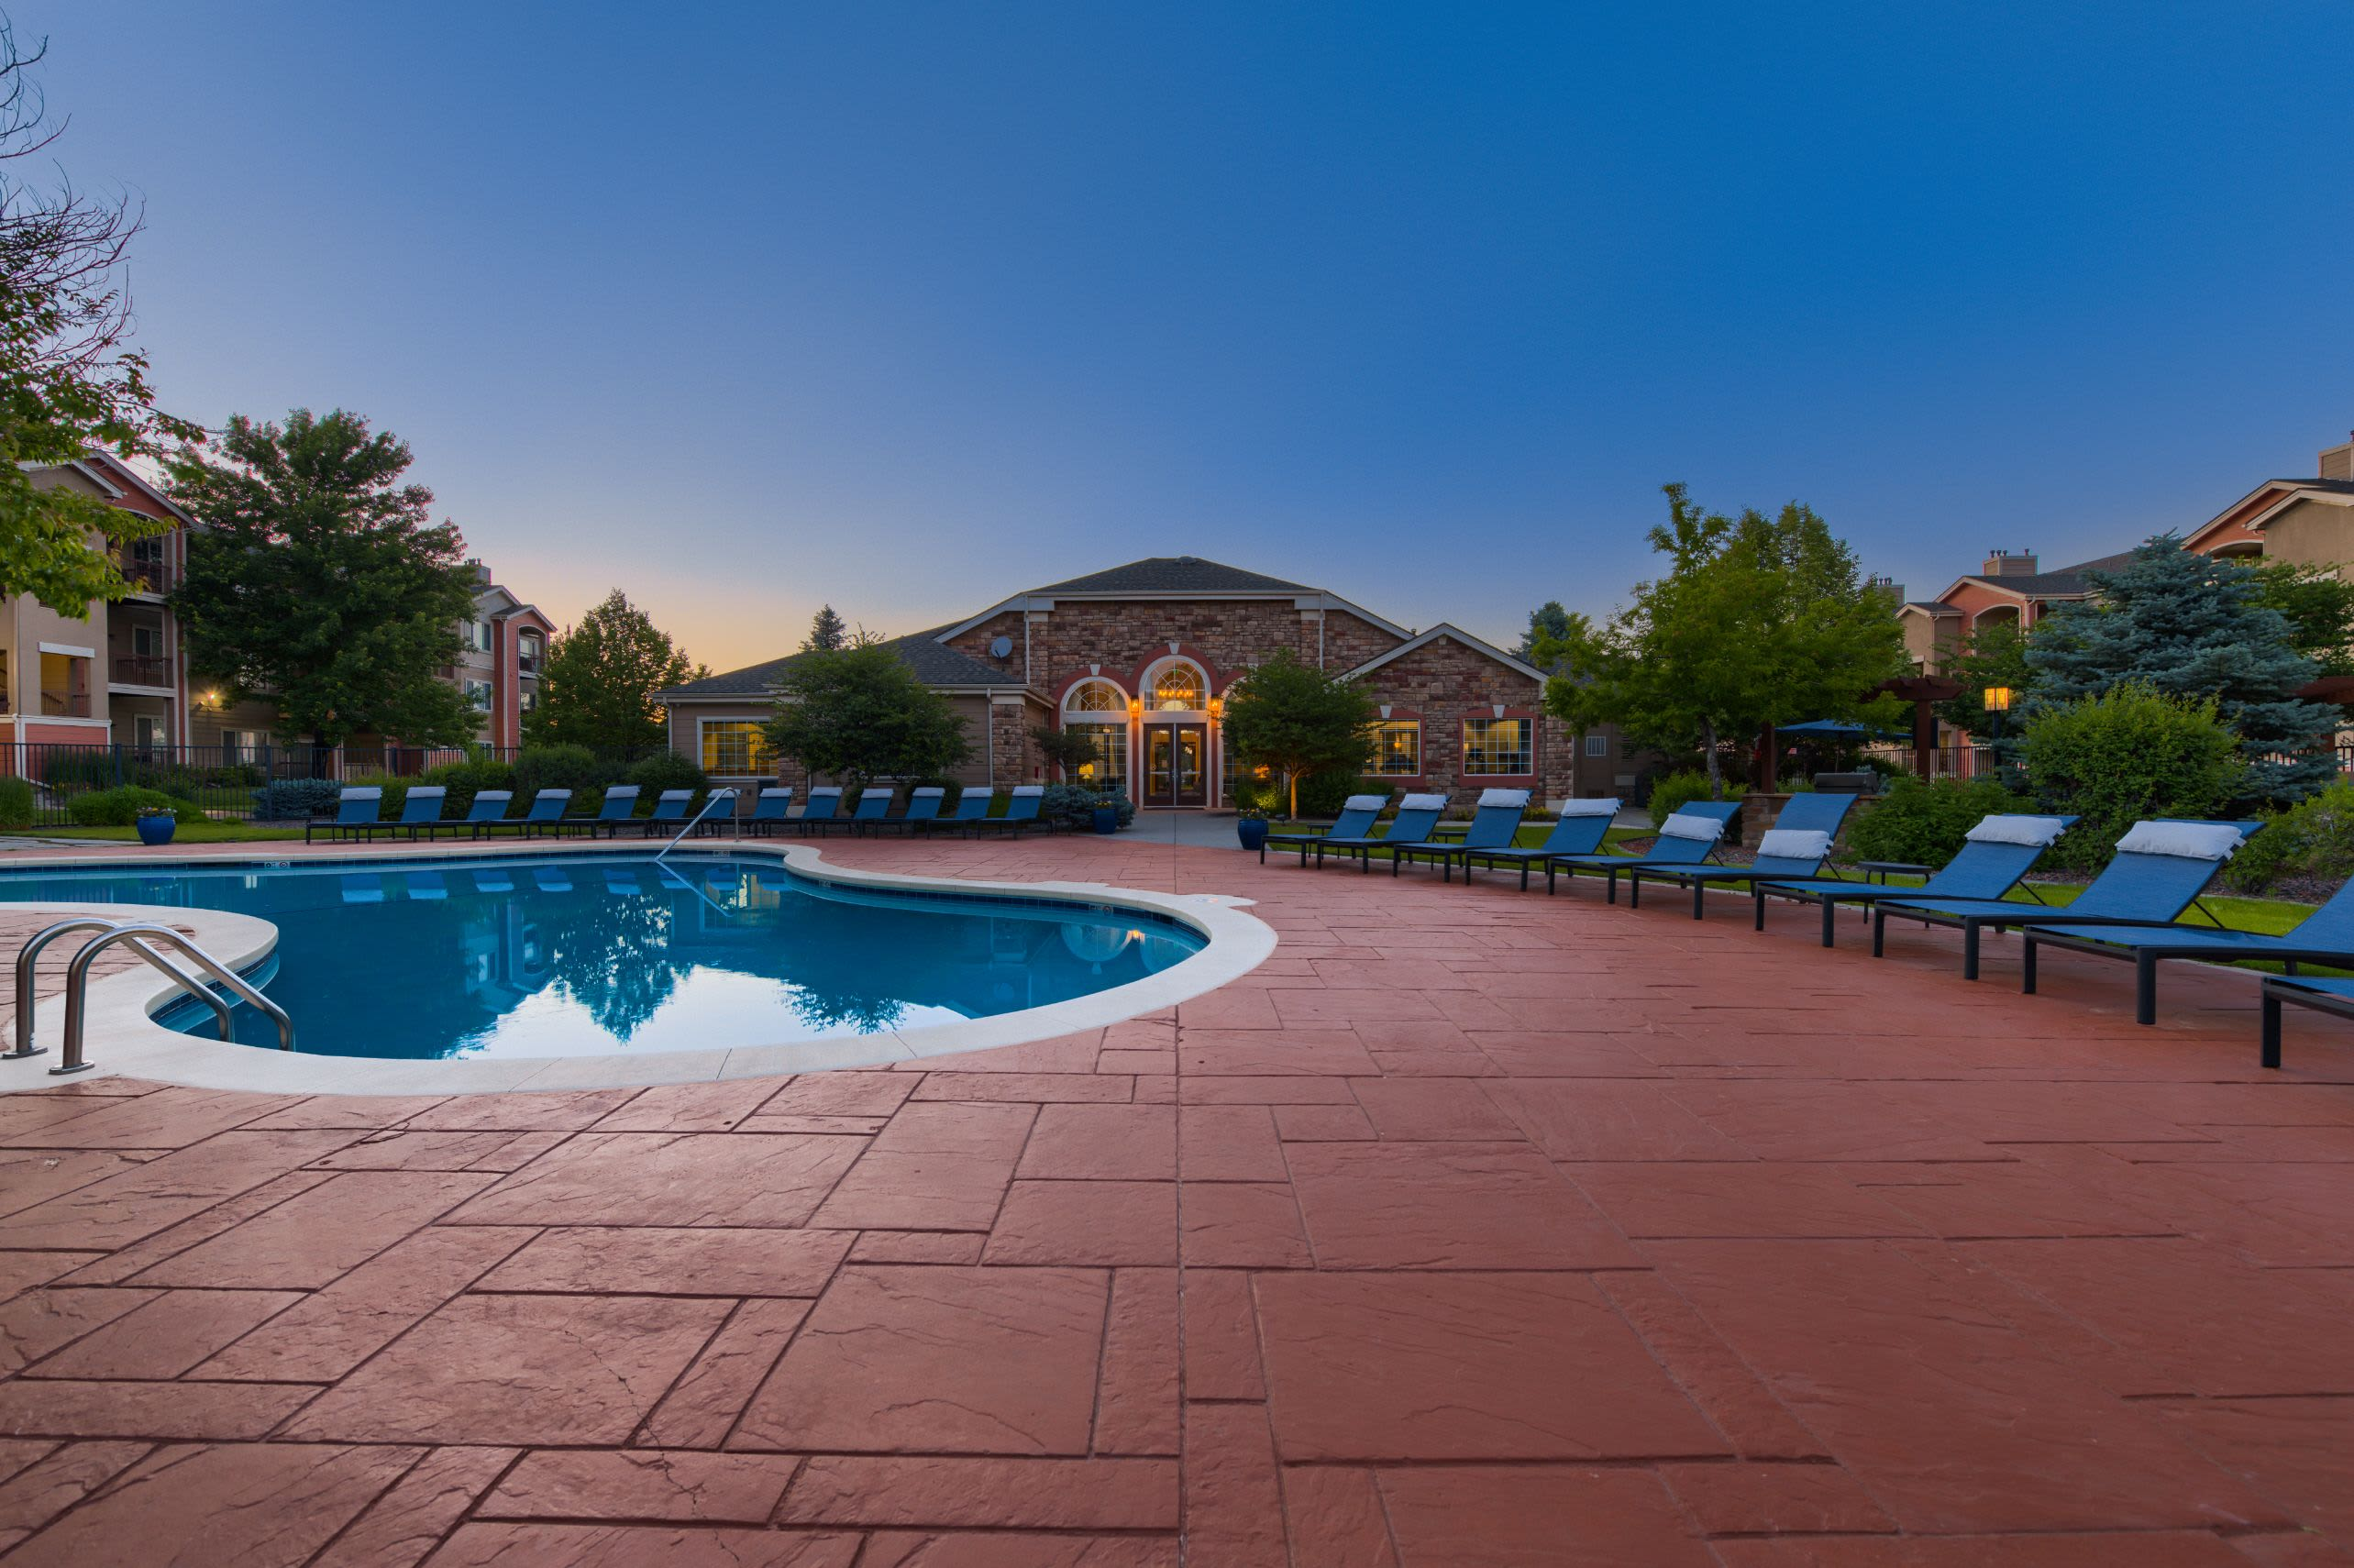 Swimming pool at twilight at Whisper Creek Apartment Homes in Lakewood, Colorado